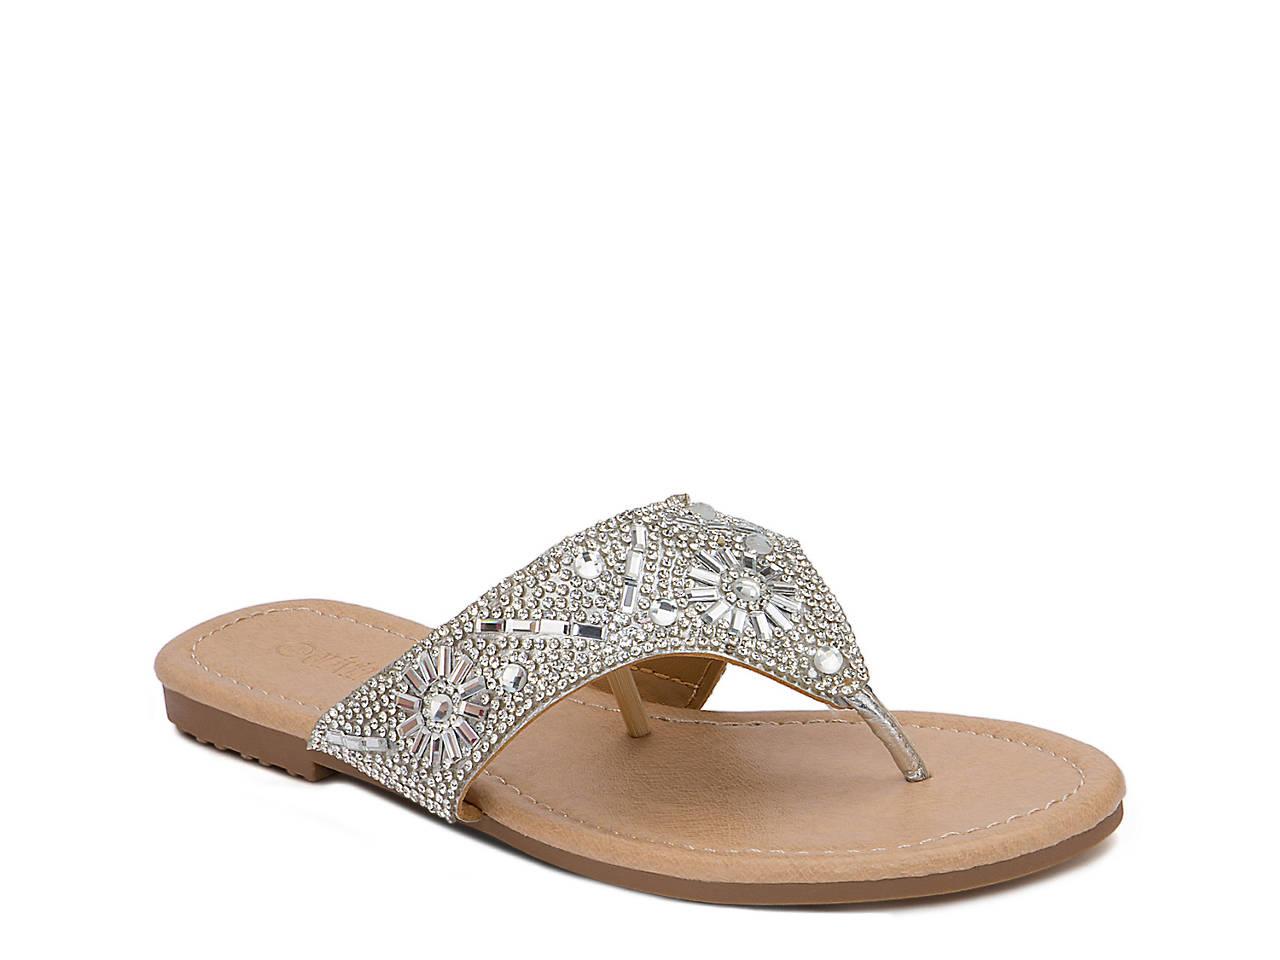 06586d6ec648 Olivia Miller Tamarac Sandal Women s Shoes